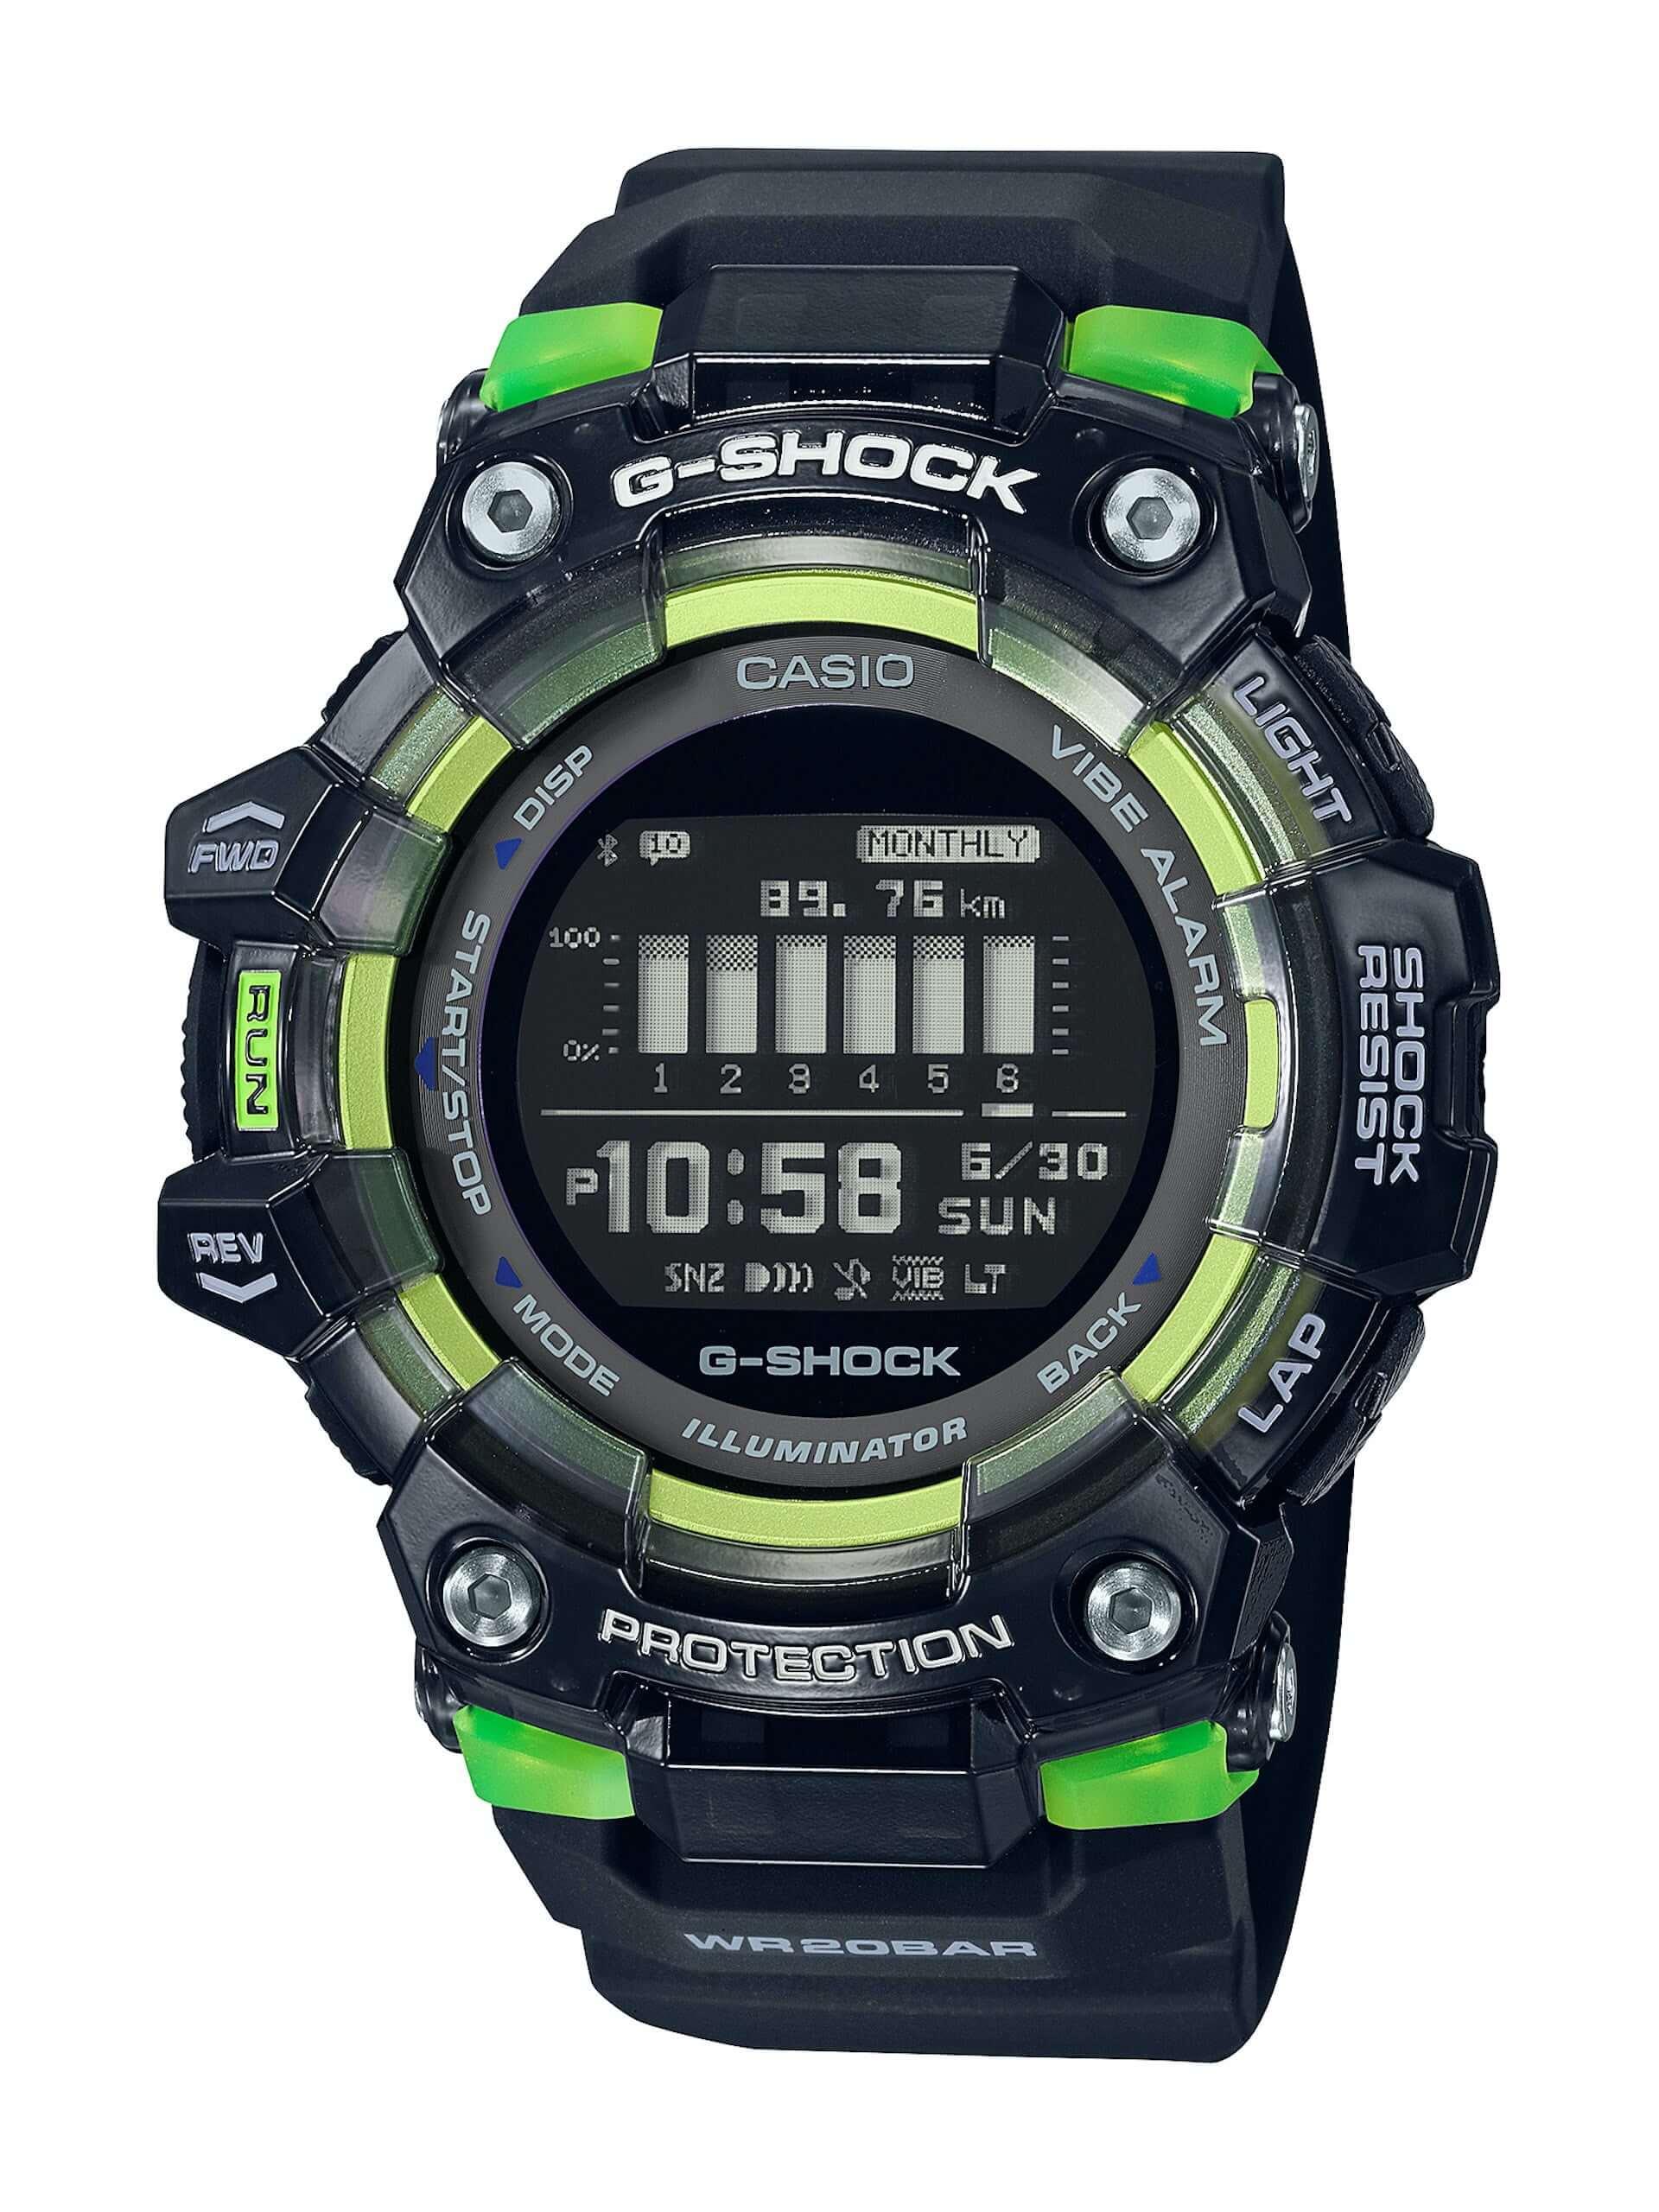 CASIOからG-SHOCK『GBD-100』『GMW-B5000』の新色やPRO TREK『PRG-240』の新モデルなど続々登場!1月発売の新製品ラインナップが発表 tech210118_casio_12-1920x2560